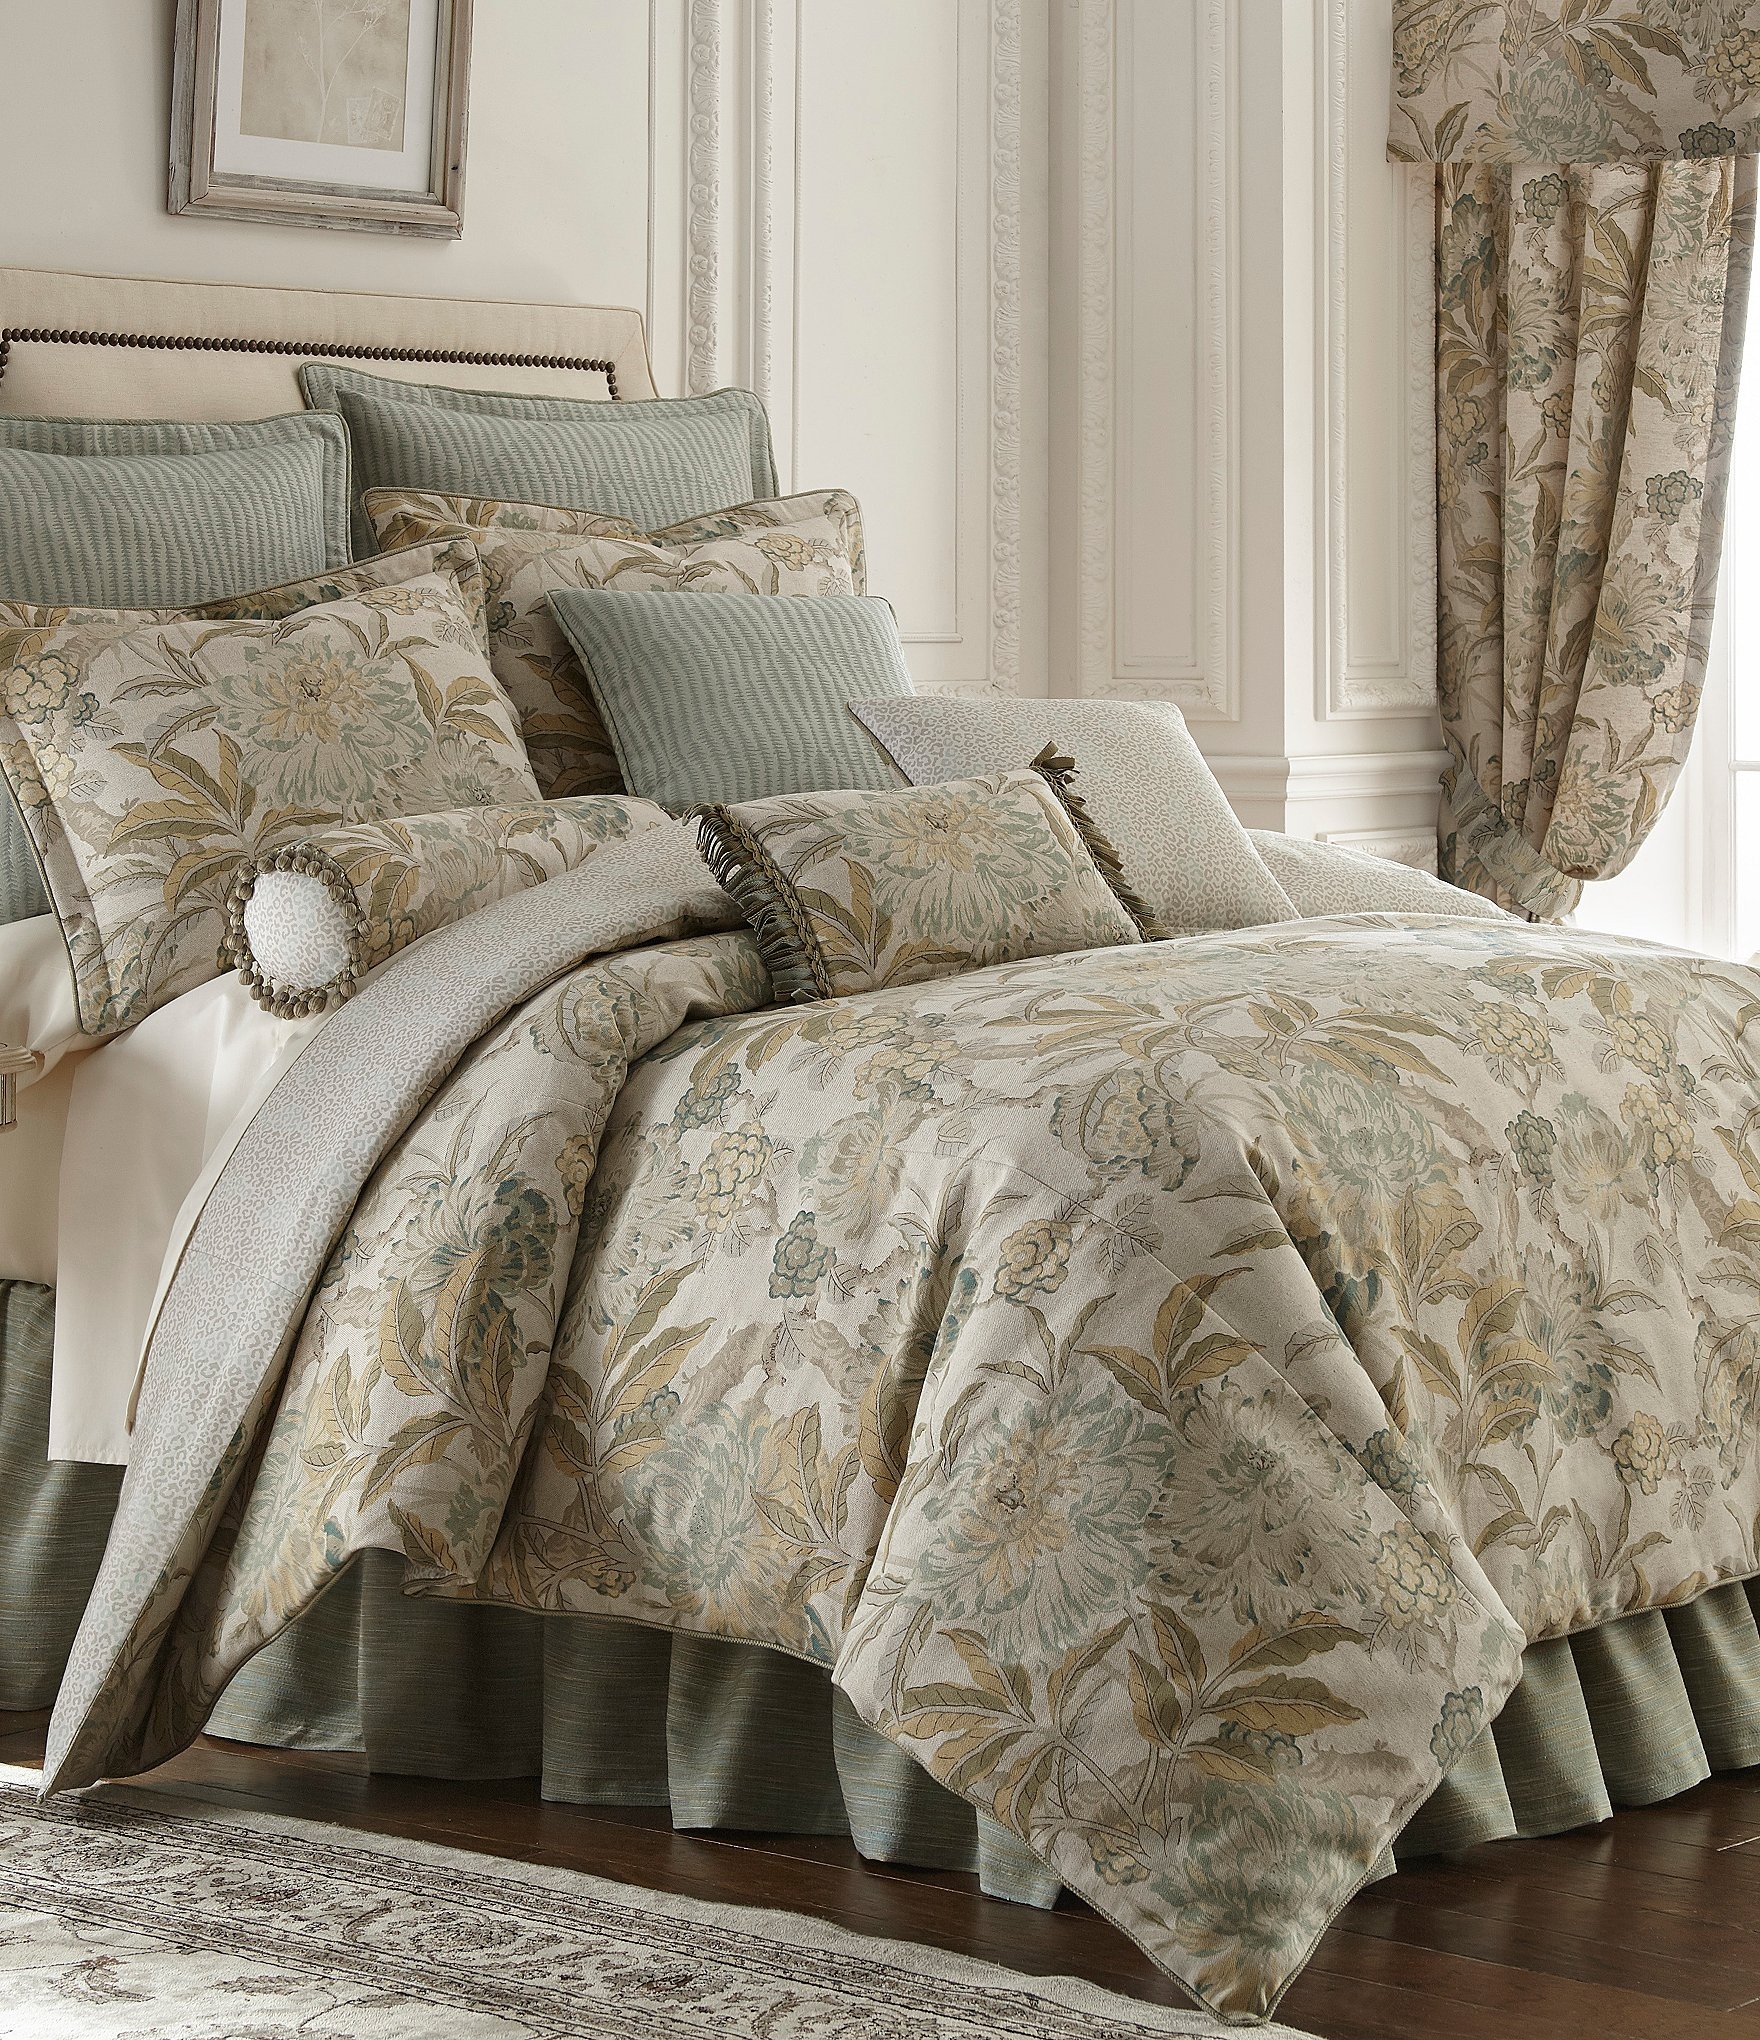 Billabong bedding sets - Billabong Bedding Sets 6